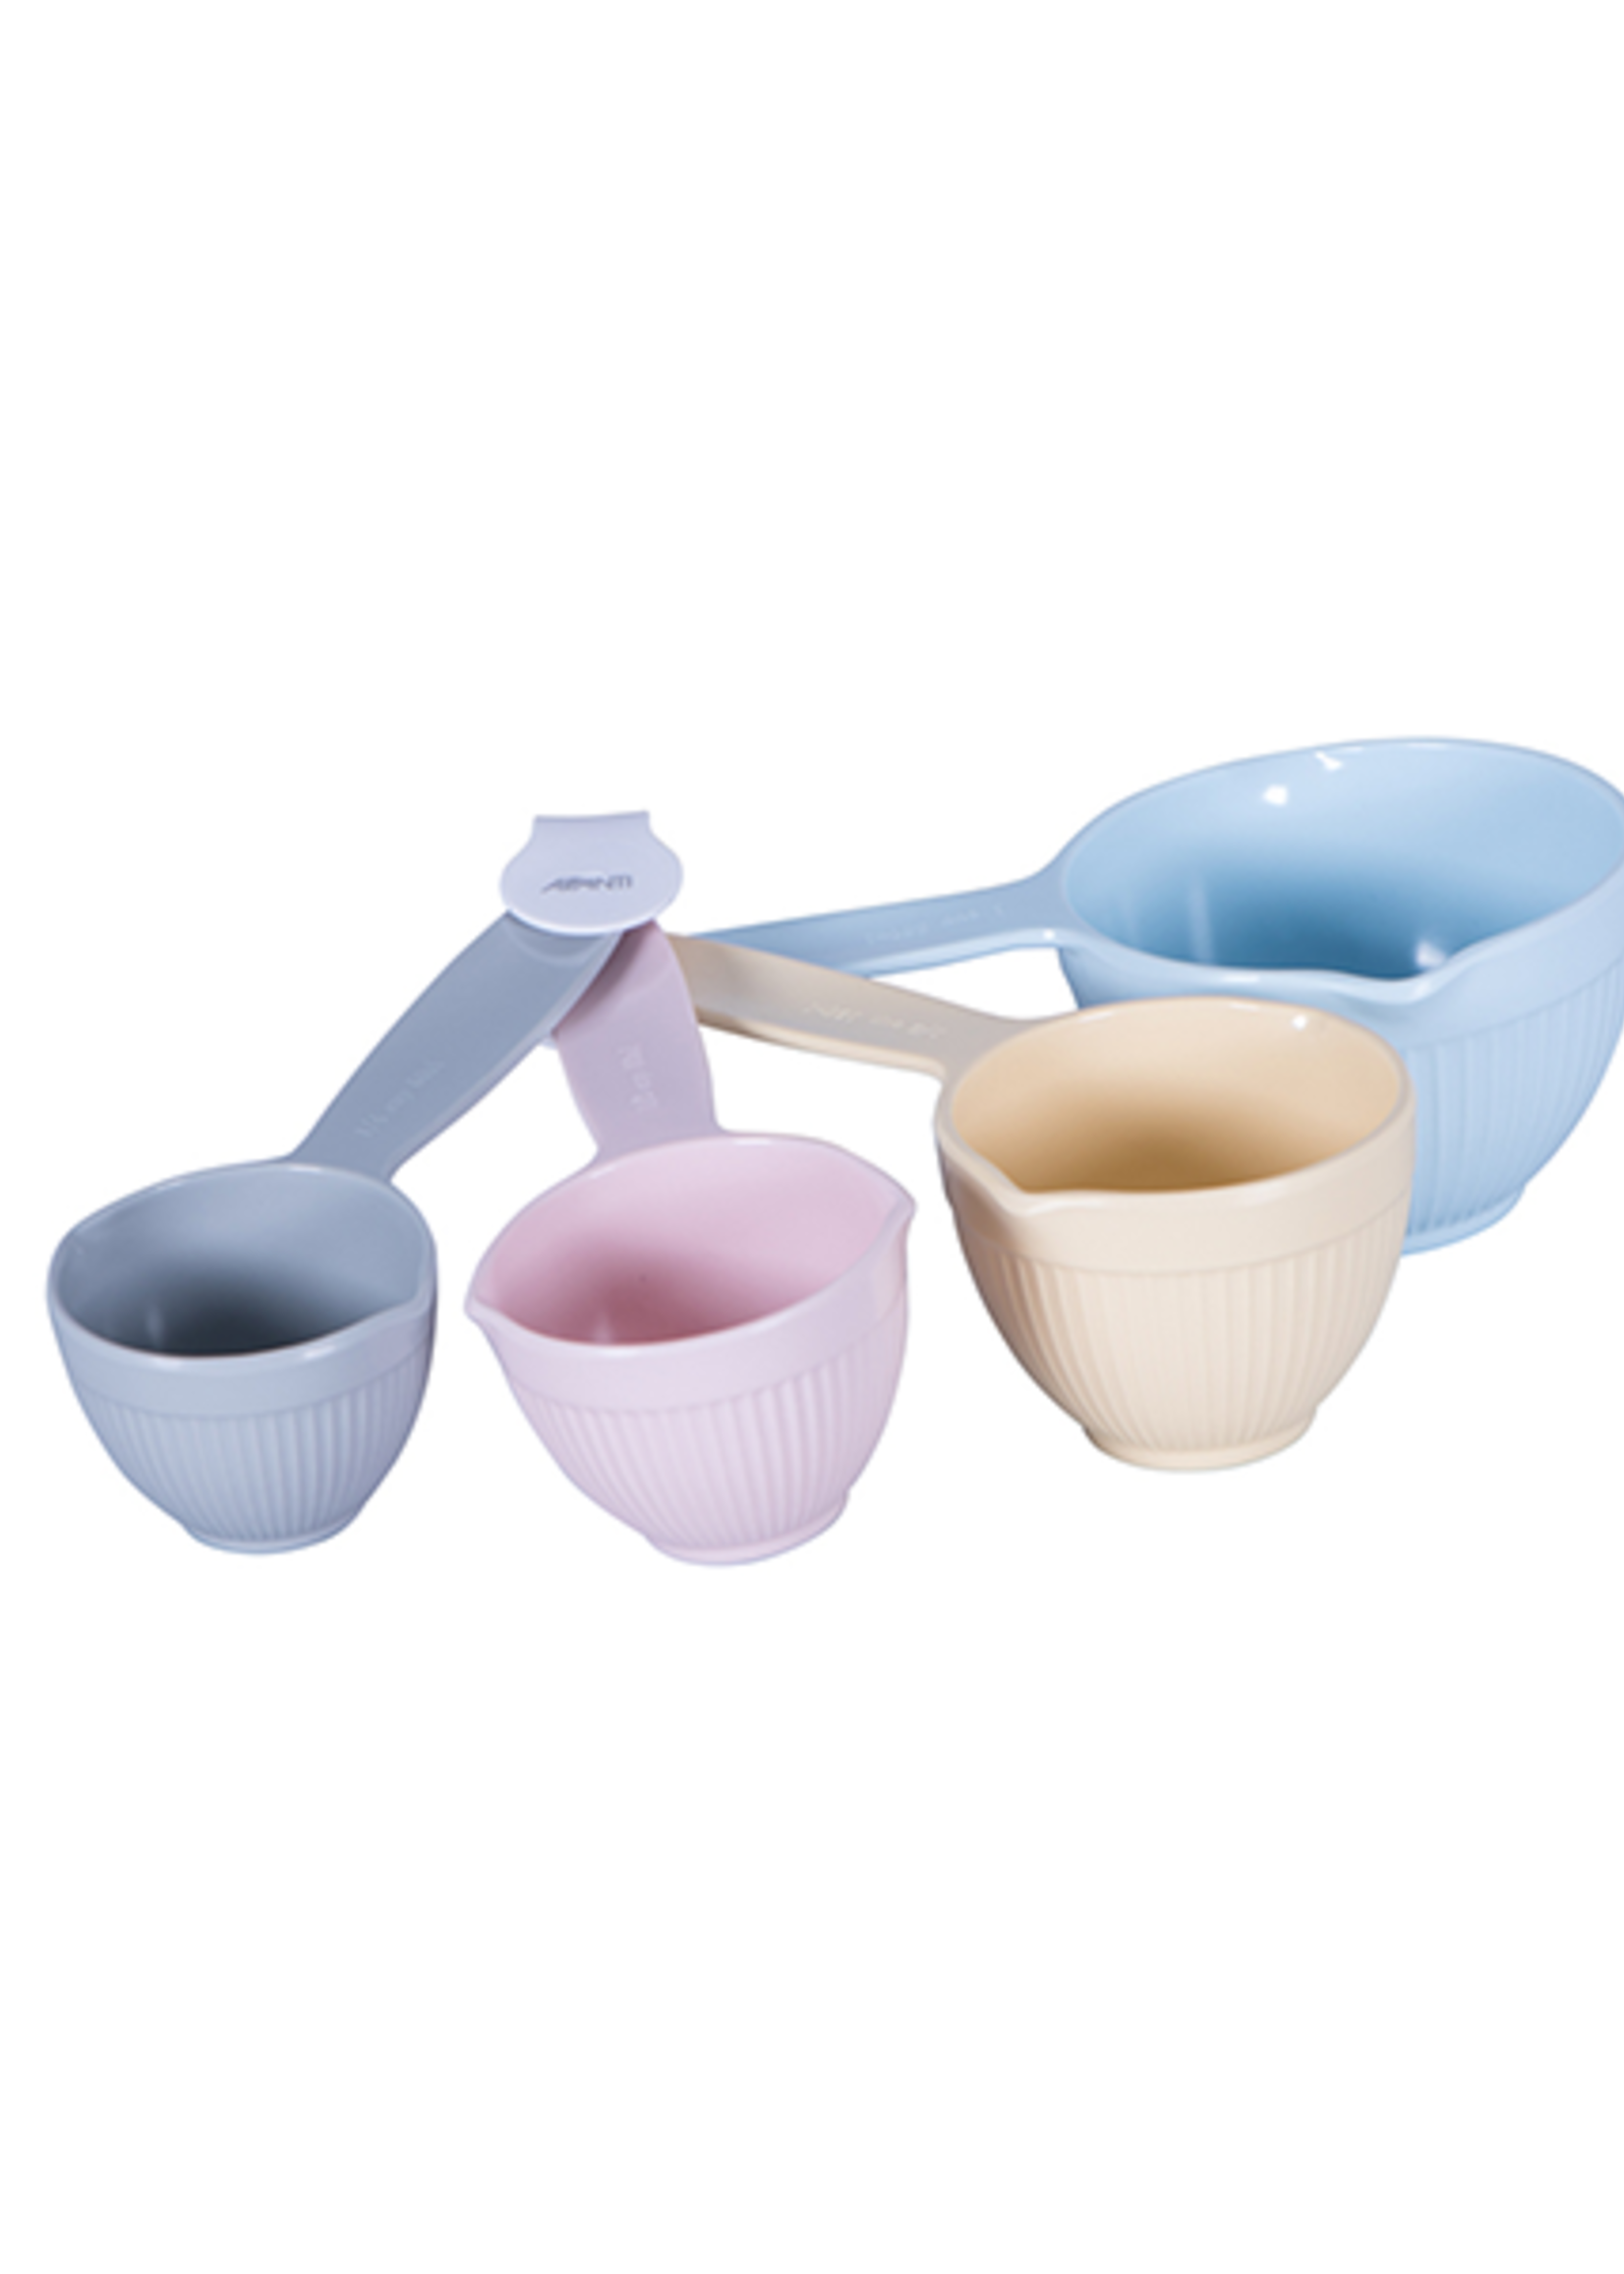 Avanti Homewares Ribbed Measuring Cups - Pastel